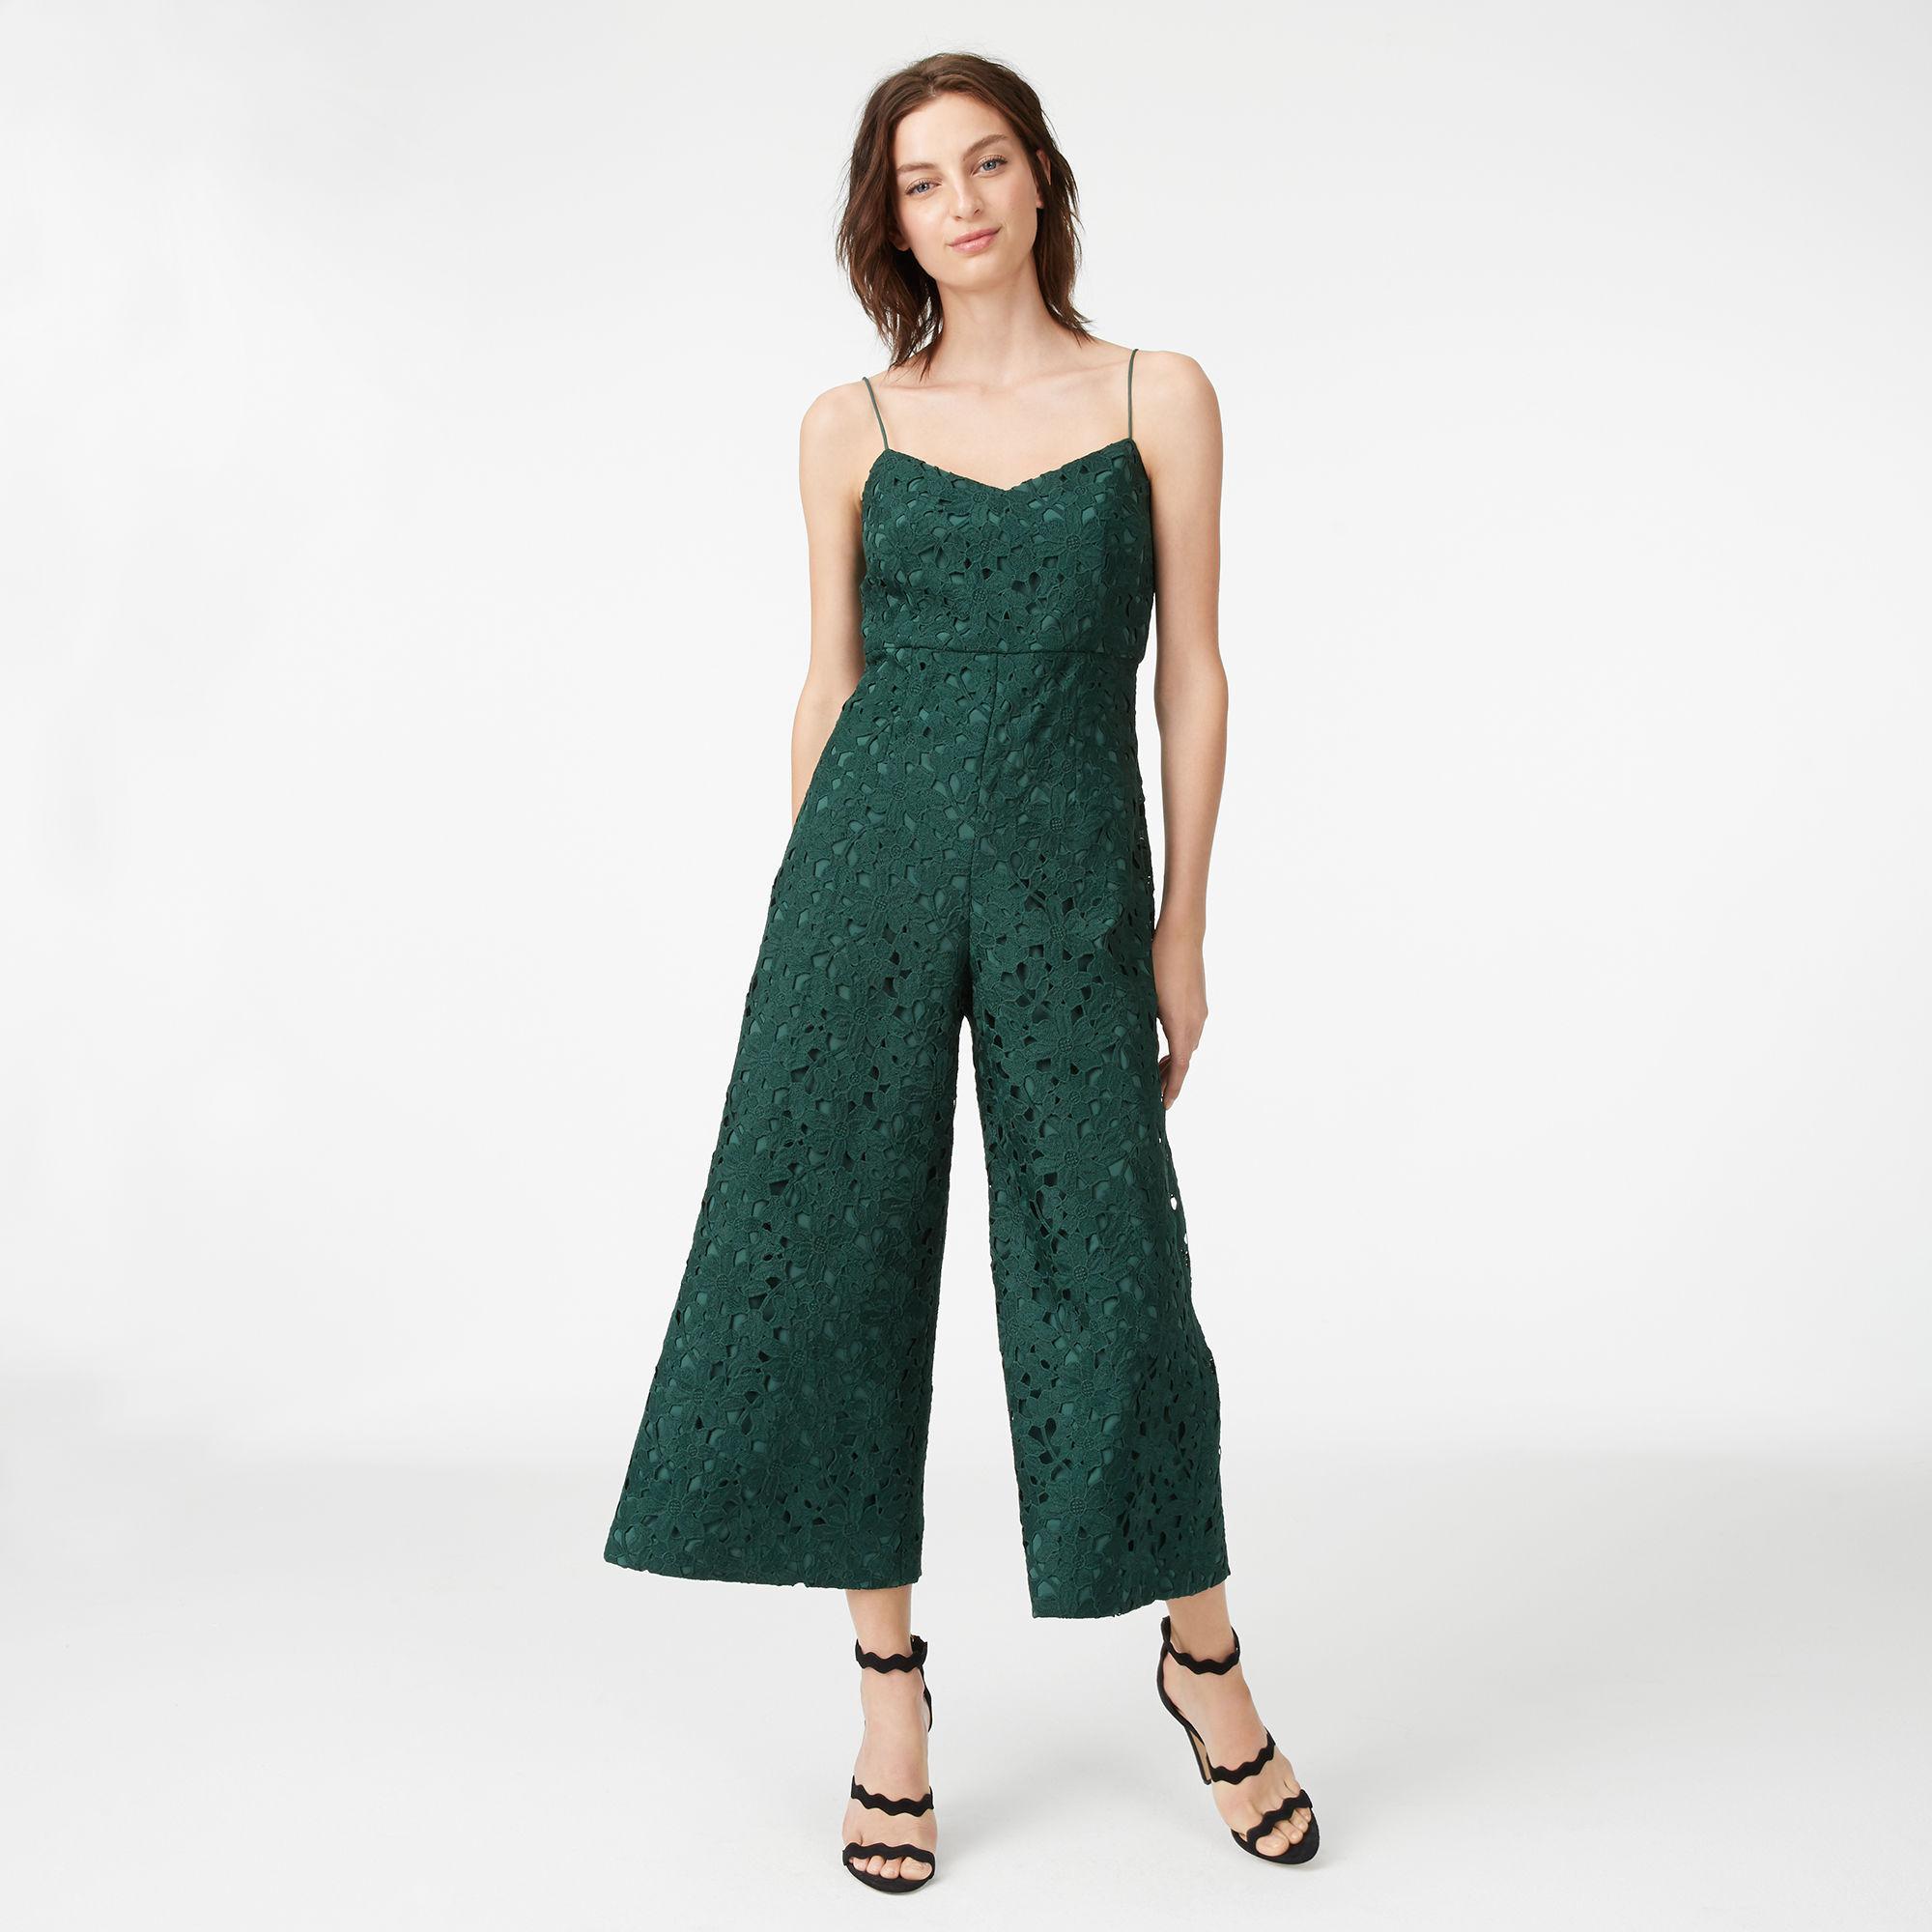 8bbaeb1c7785 Lyst - Club Monaco Samsarah Lace Jumpsuit in Green